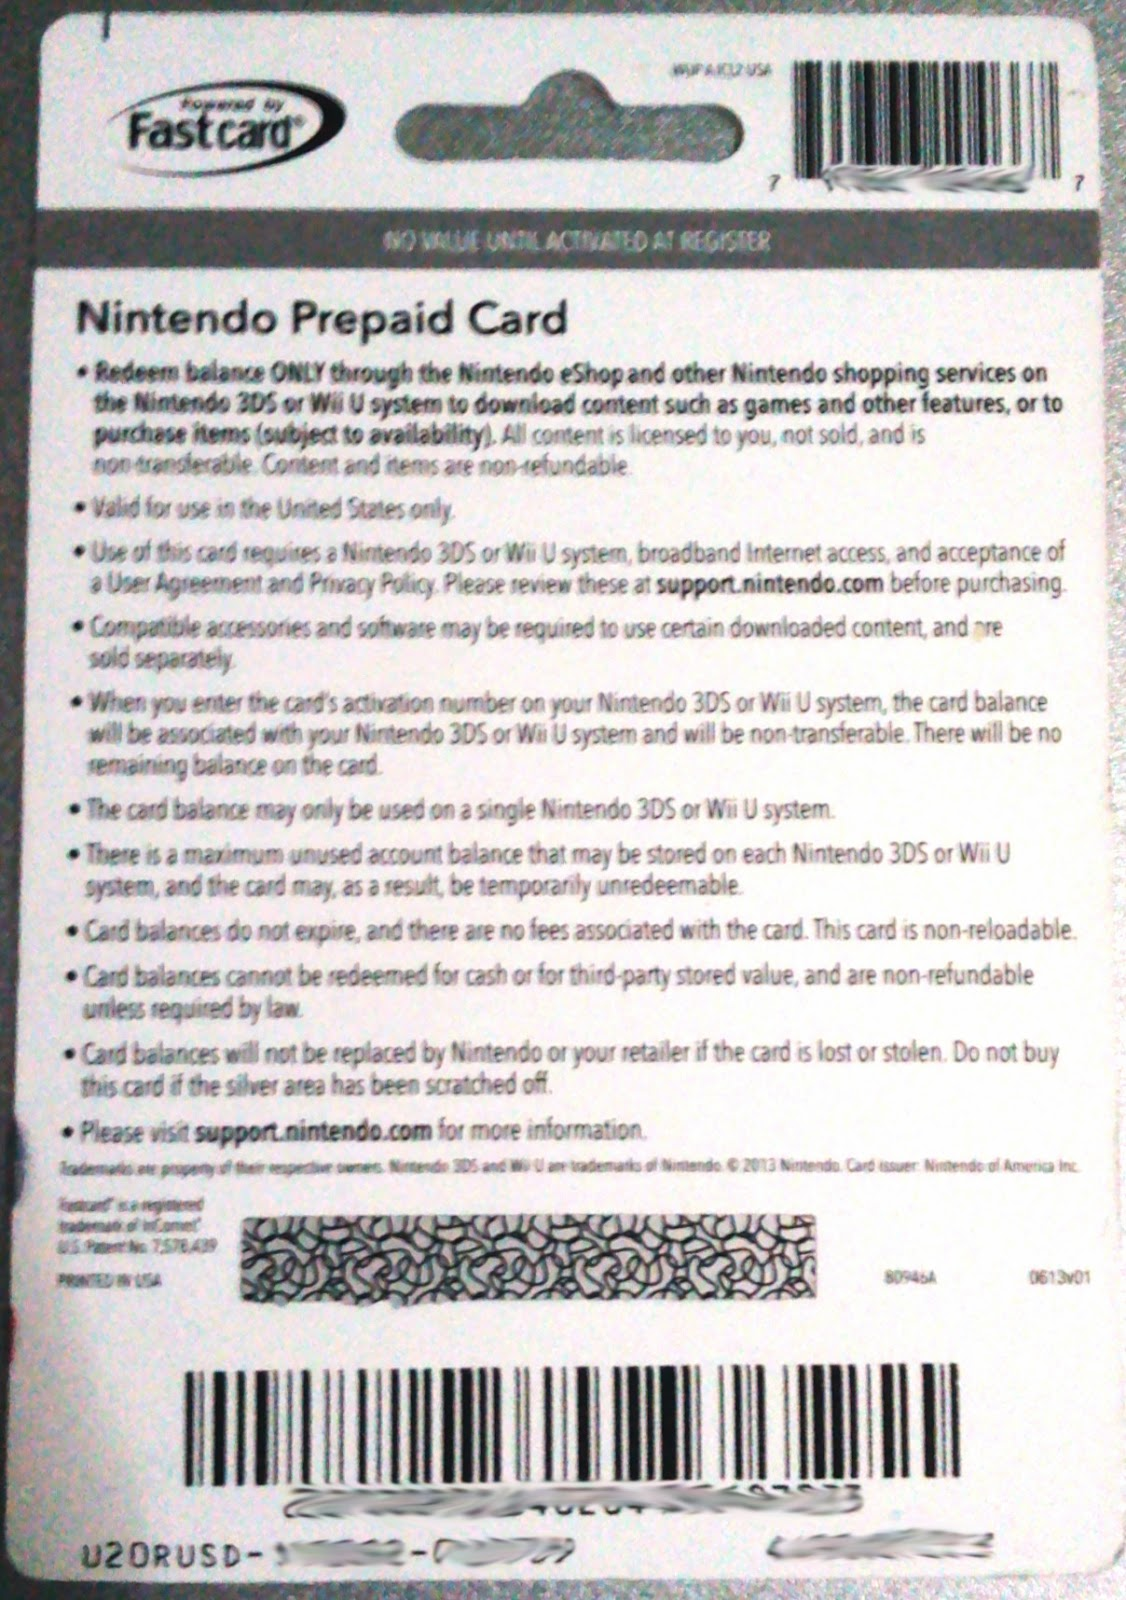 Nintendo Eshop Karte Code.Nintendo Eshop Card Code Scratched Off Columbia Branch Railroad